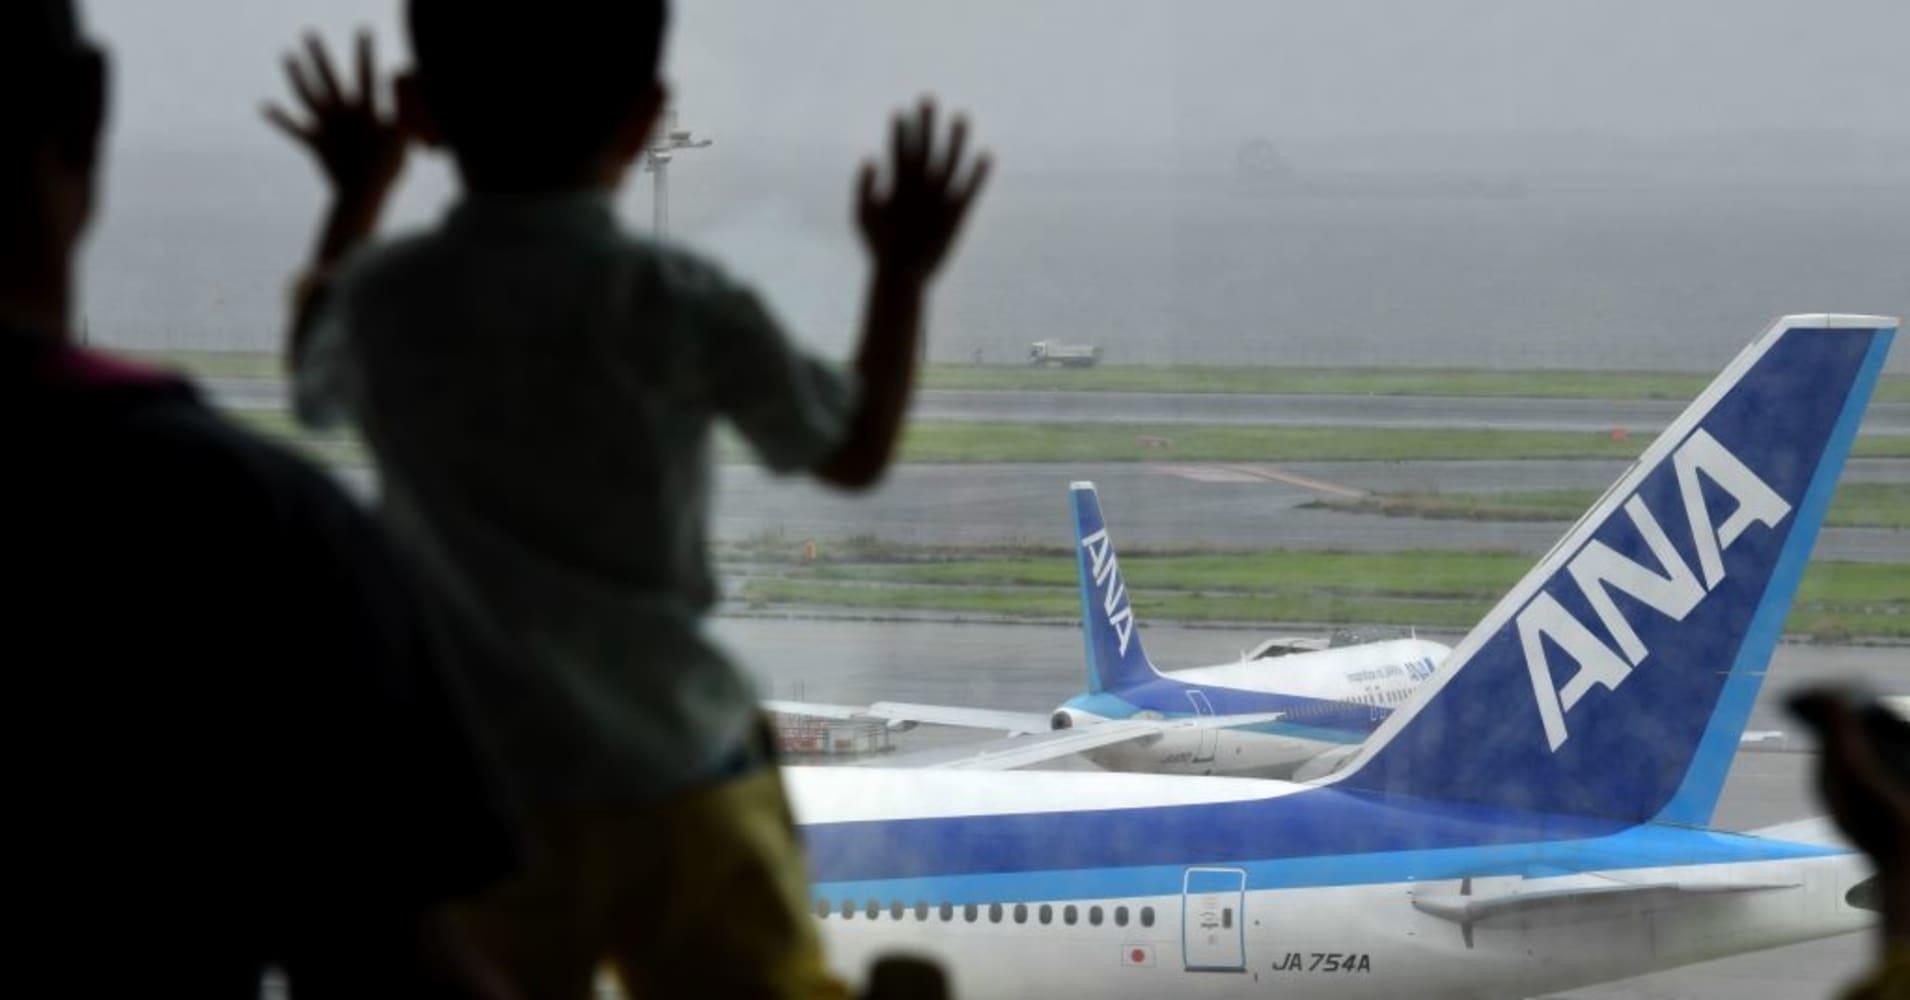 Chrissy Teigen: Tokyo-bound ANA flight turns back to LAX